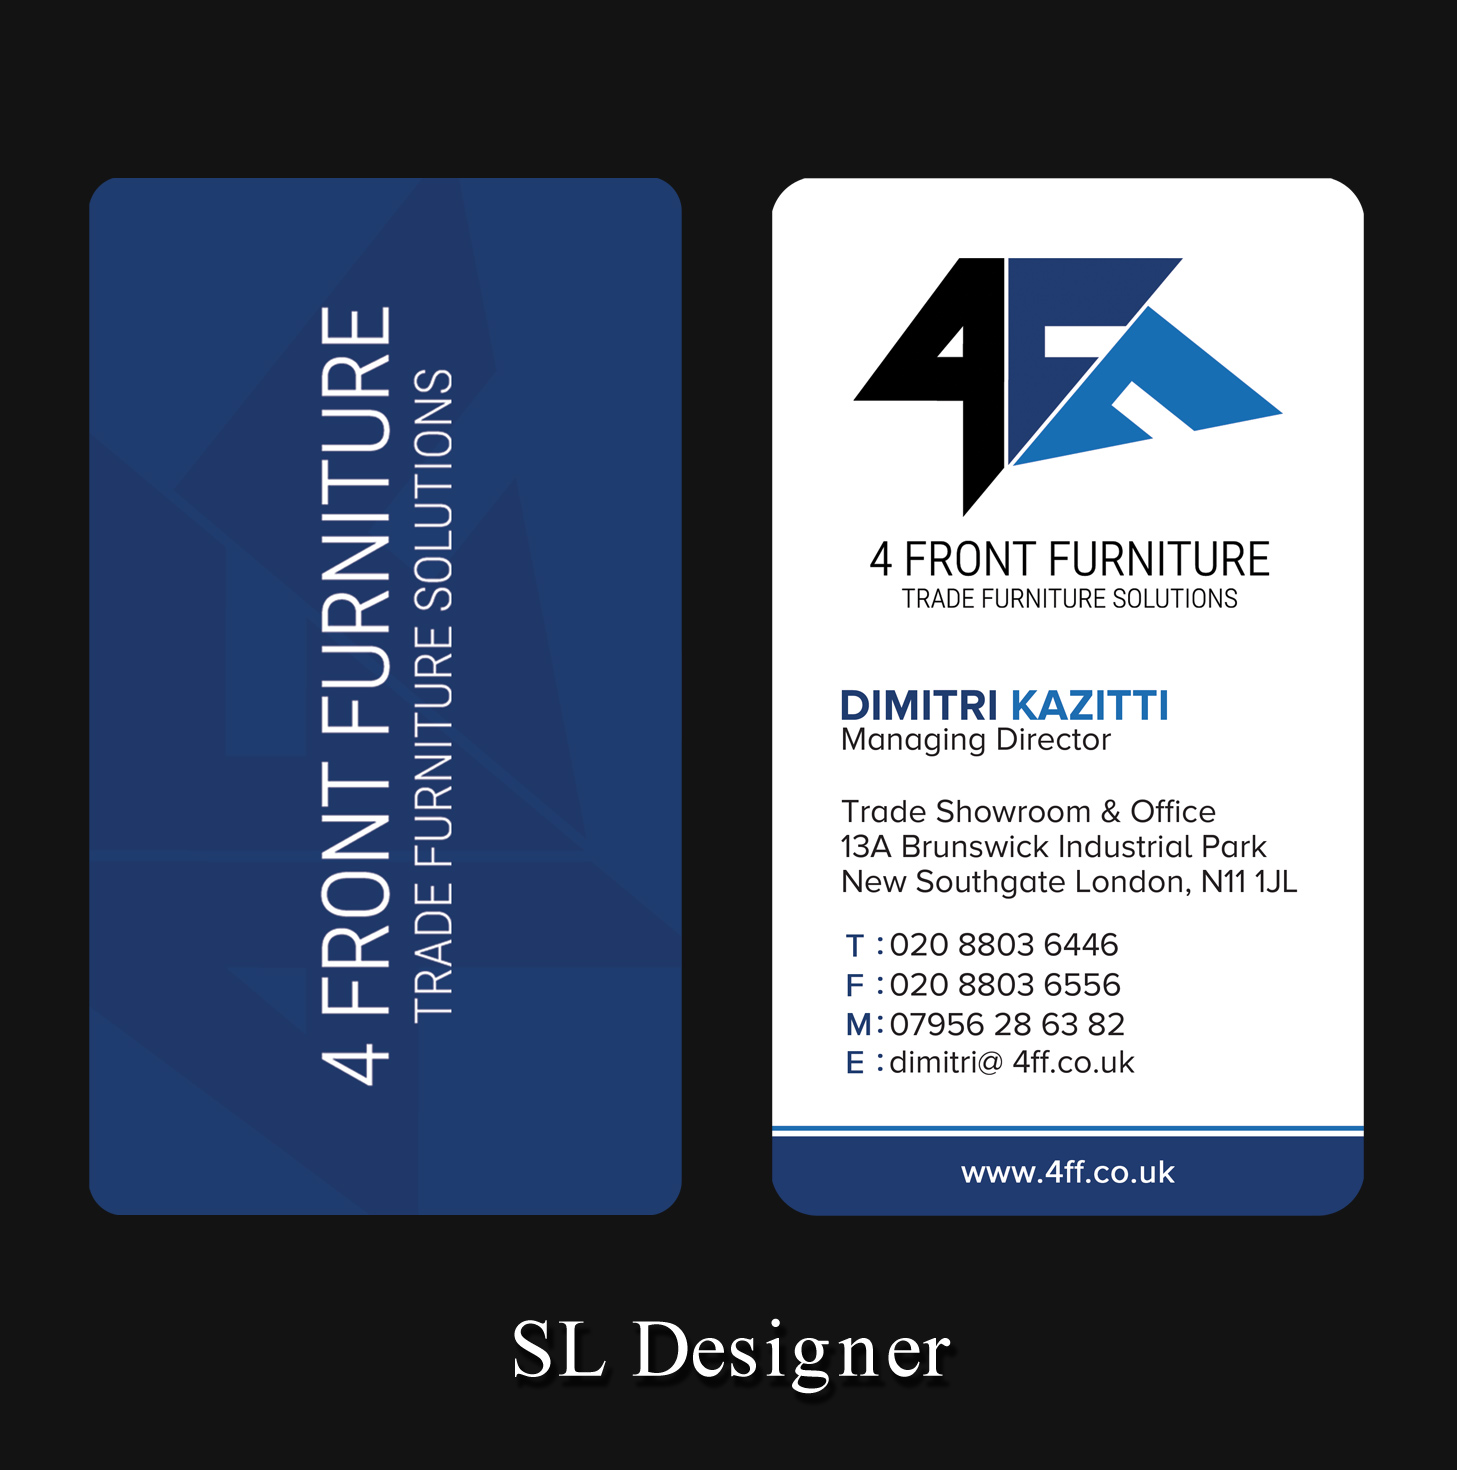 modern serious business card design for pamela kazitti by sl